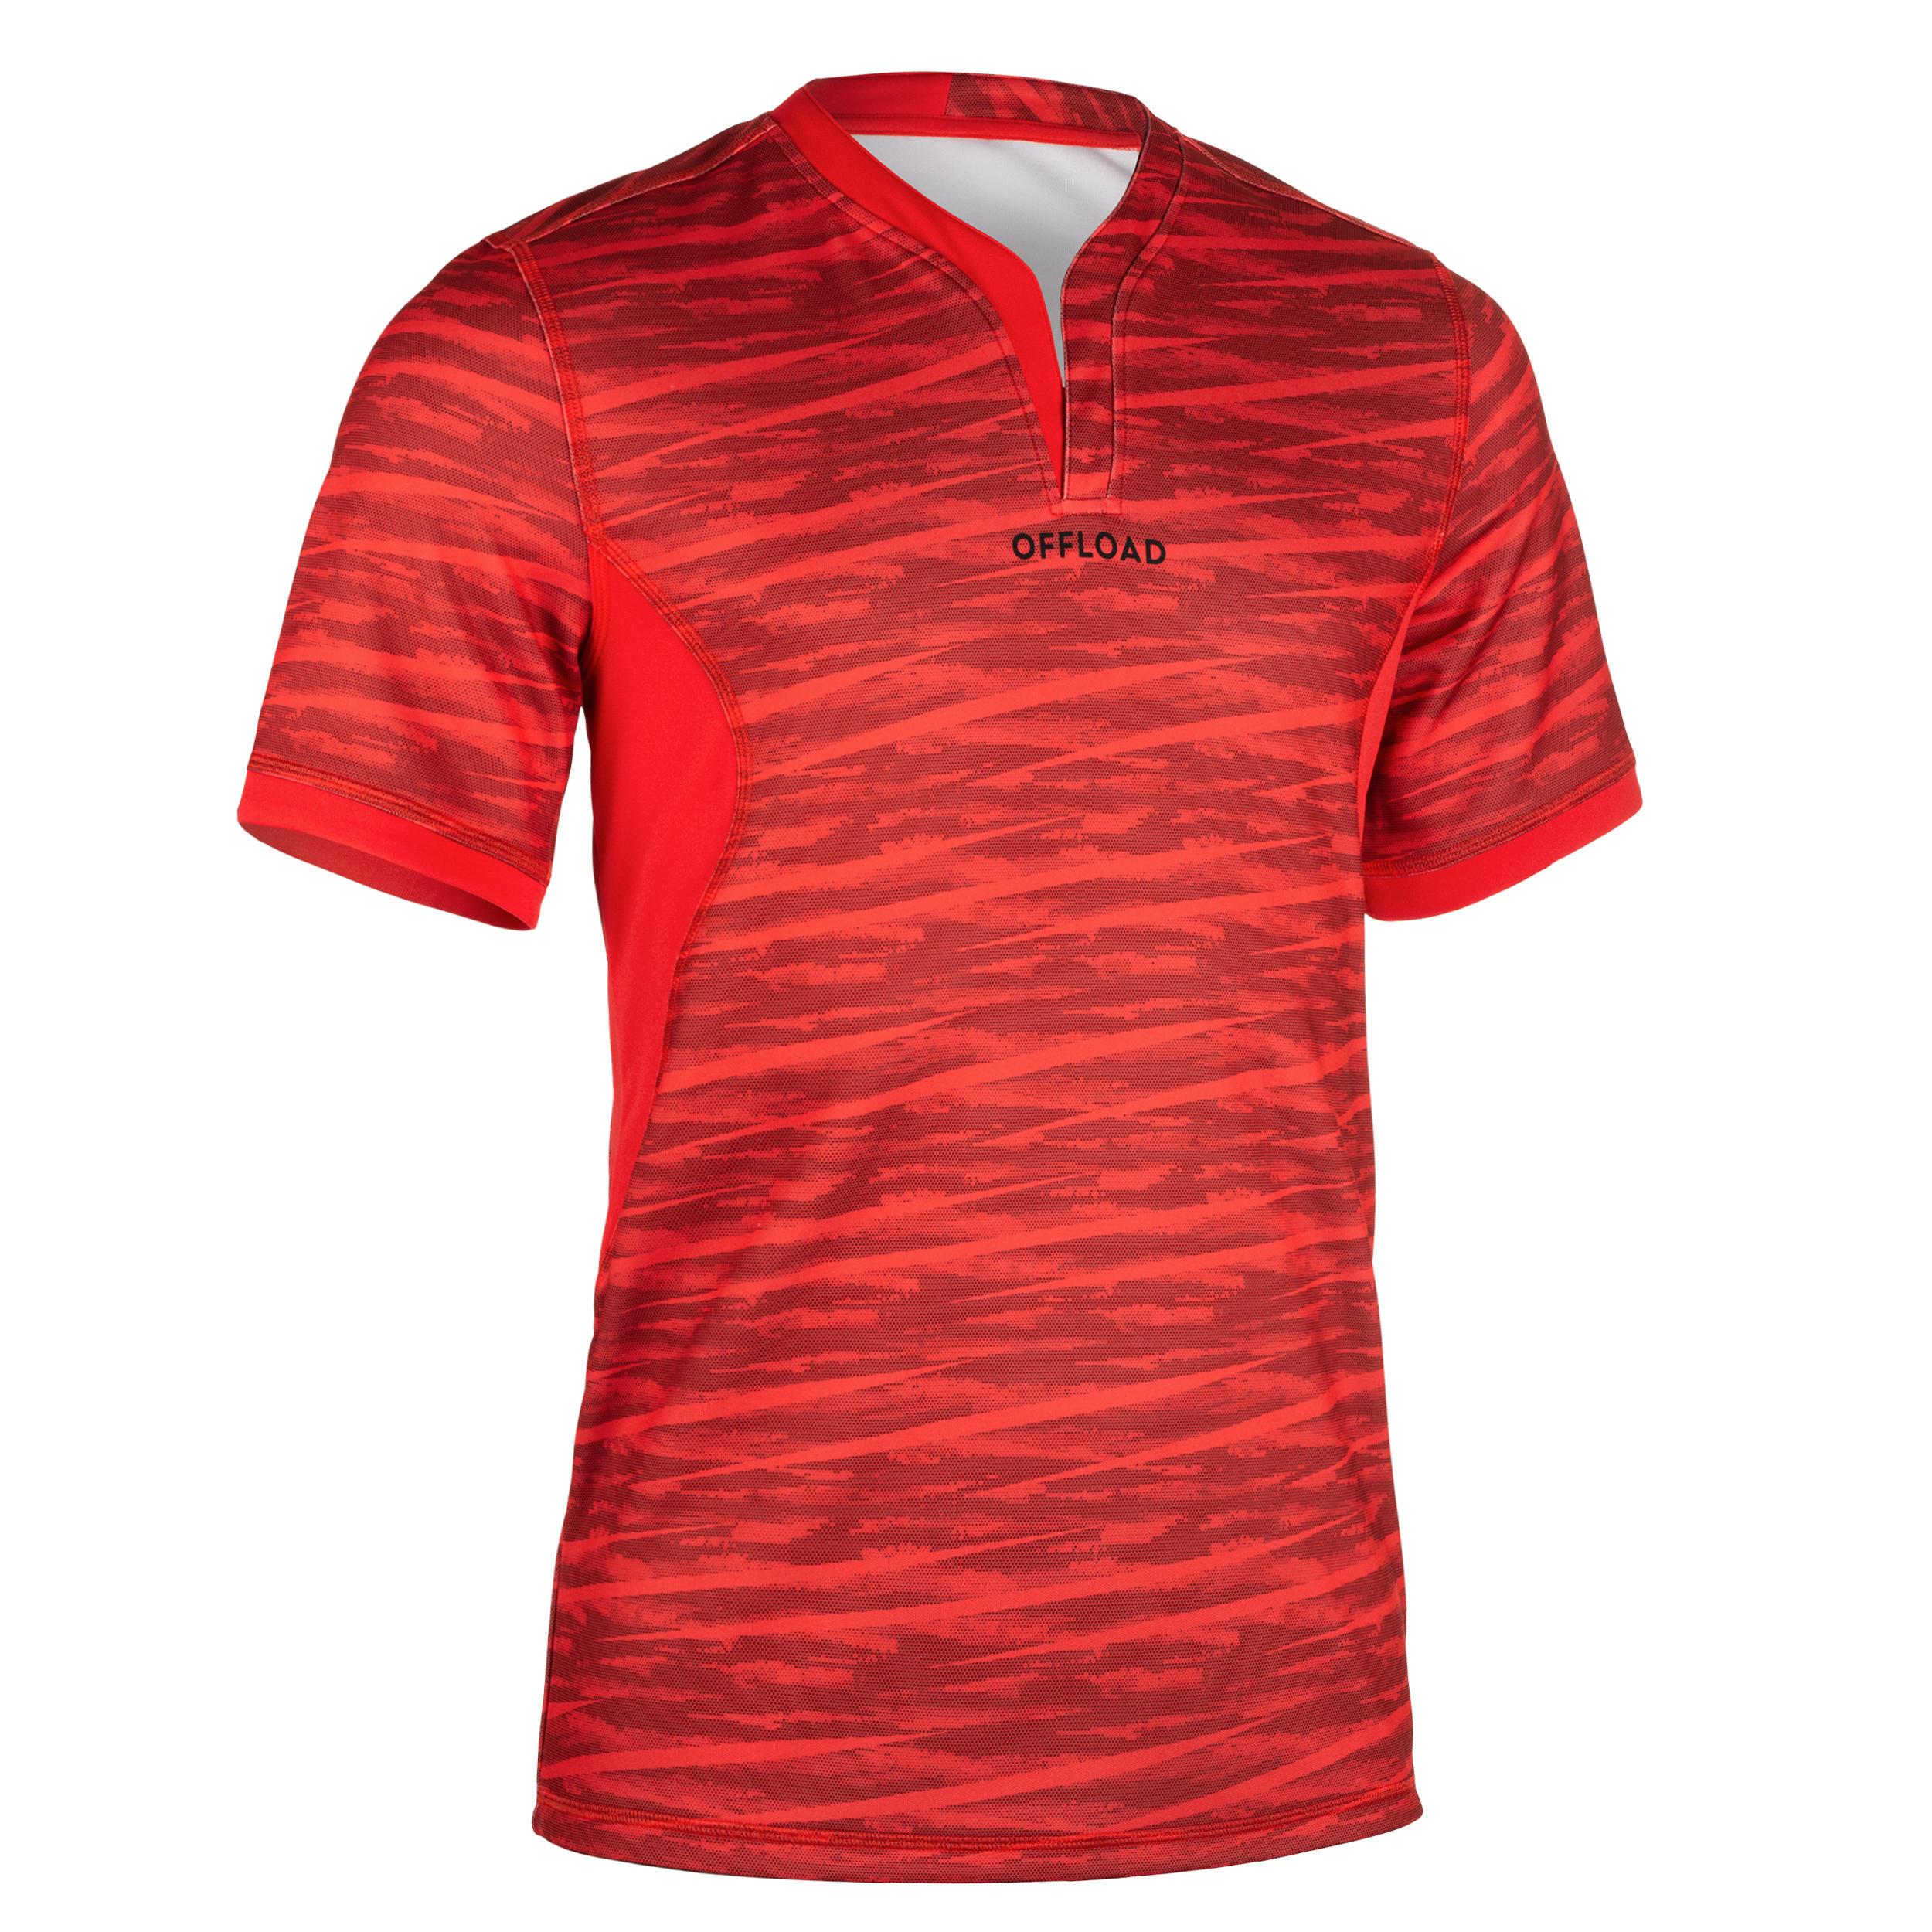 Rugby-Trikot R500 Herren rot | Sportbekleidung > Trikots > Sonstige Trikots | Rot - Schwarz | Trikot | Offload